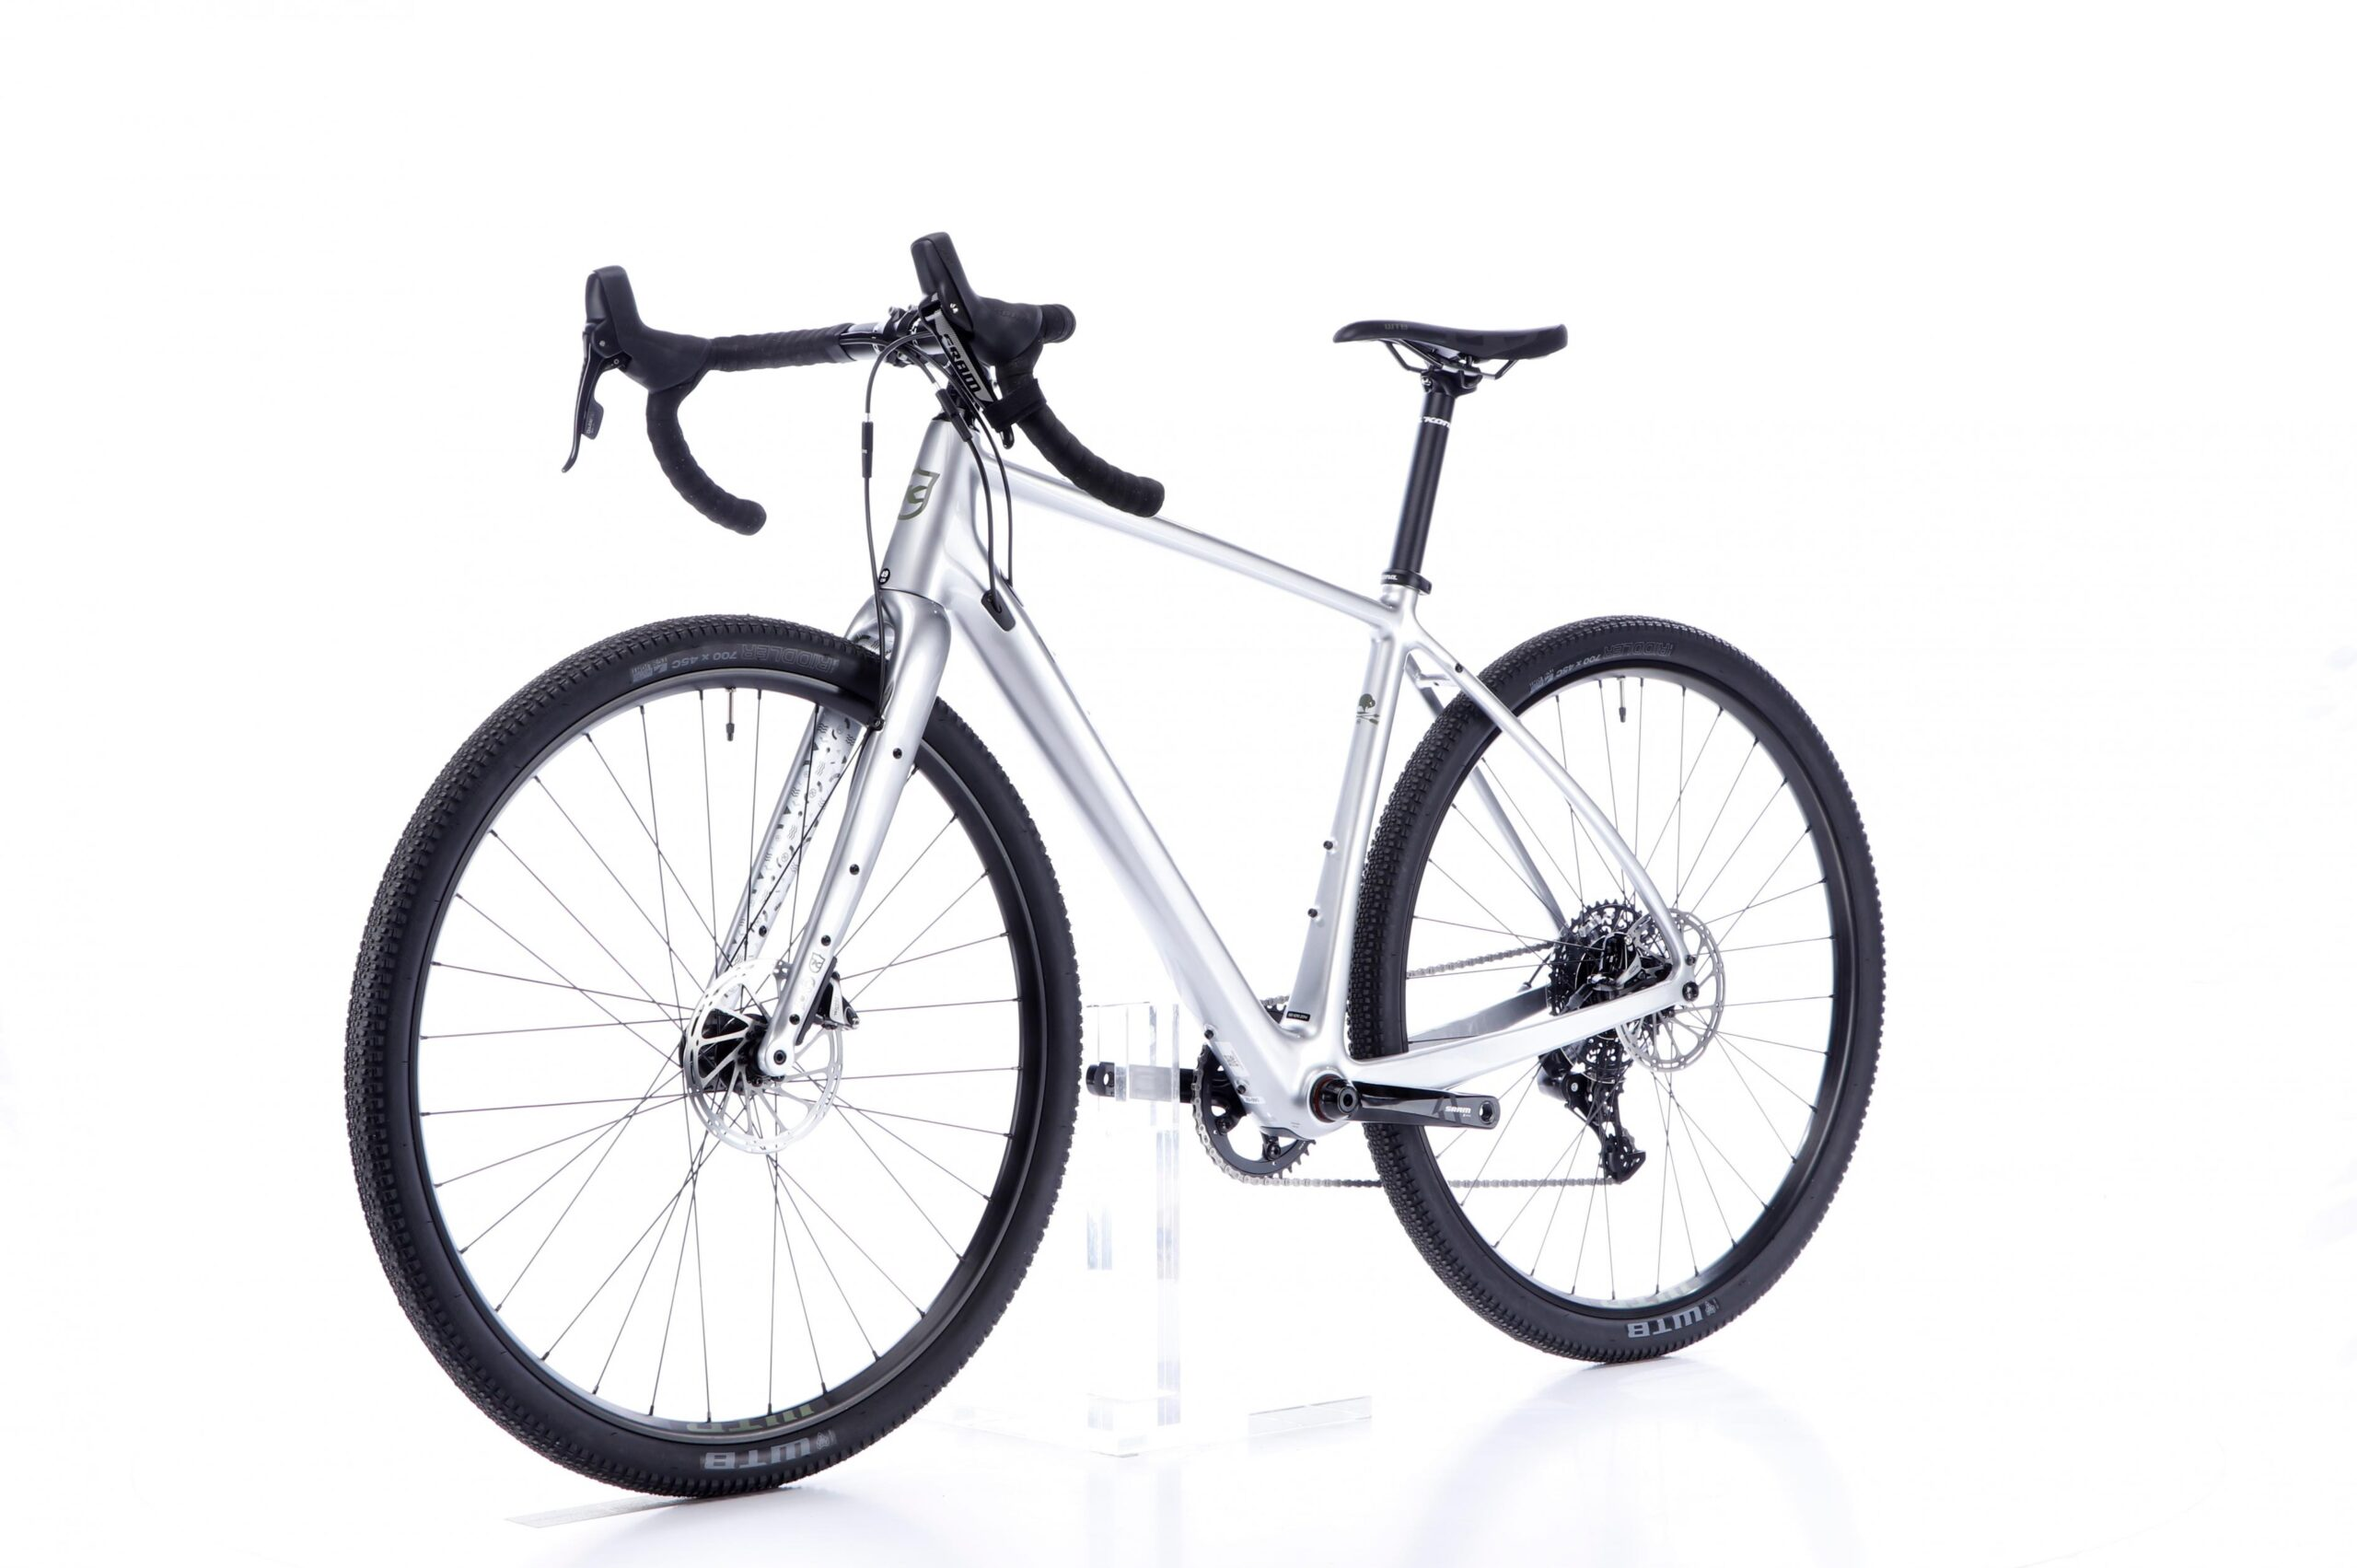 Kona_Libre_Carbon_Gravel-__Cyclocross_Bikes_5hMHXjZOf4pYCT